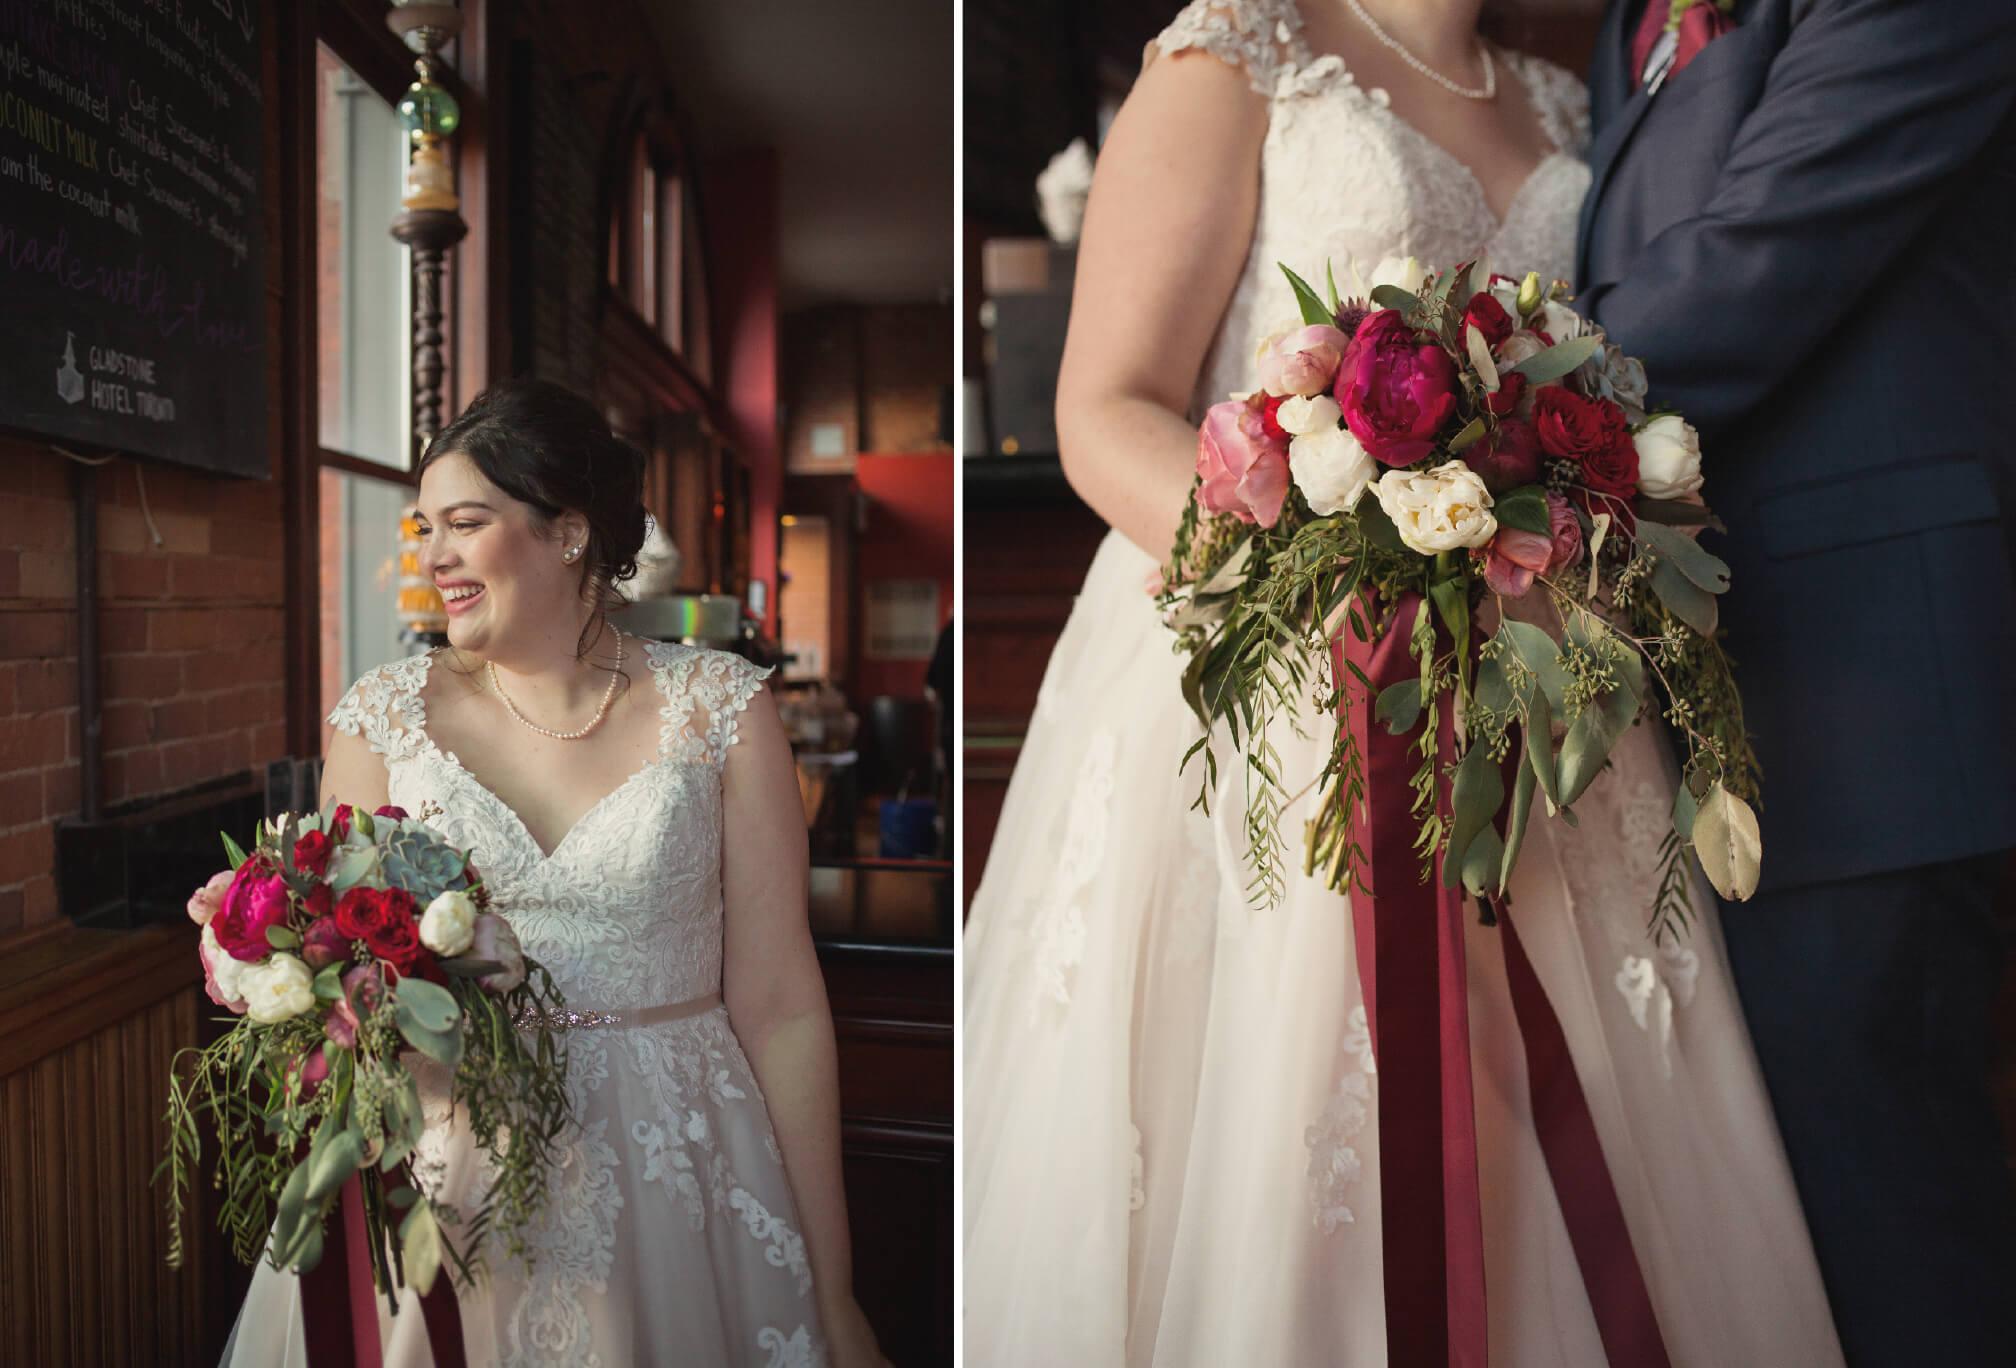 bride and groom photo locations gladstone